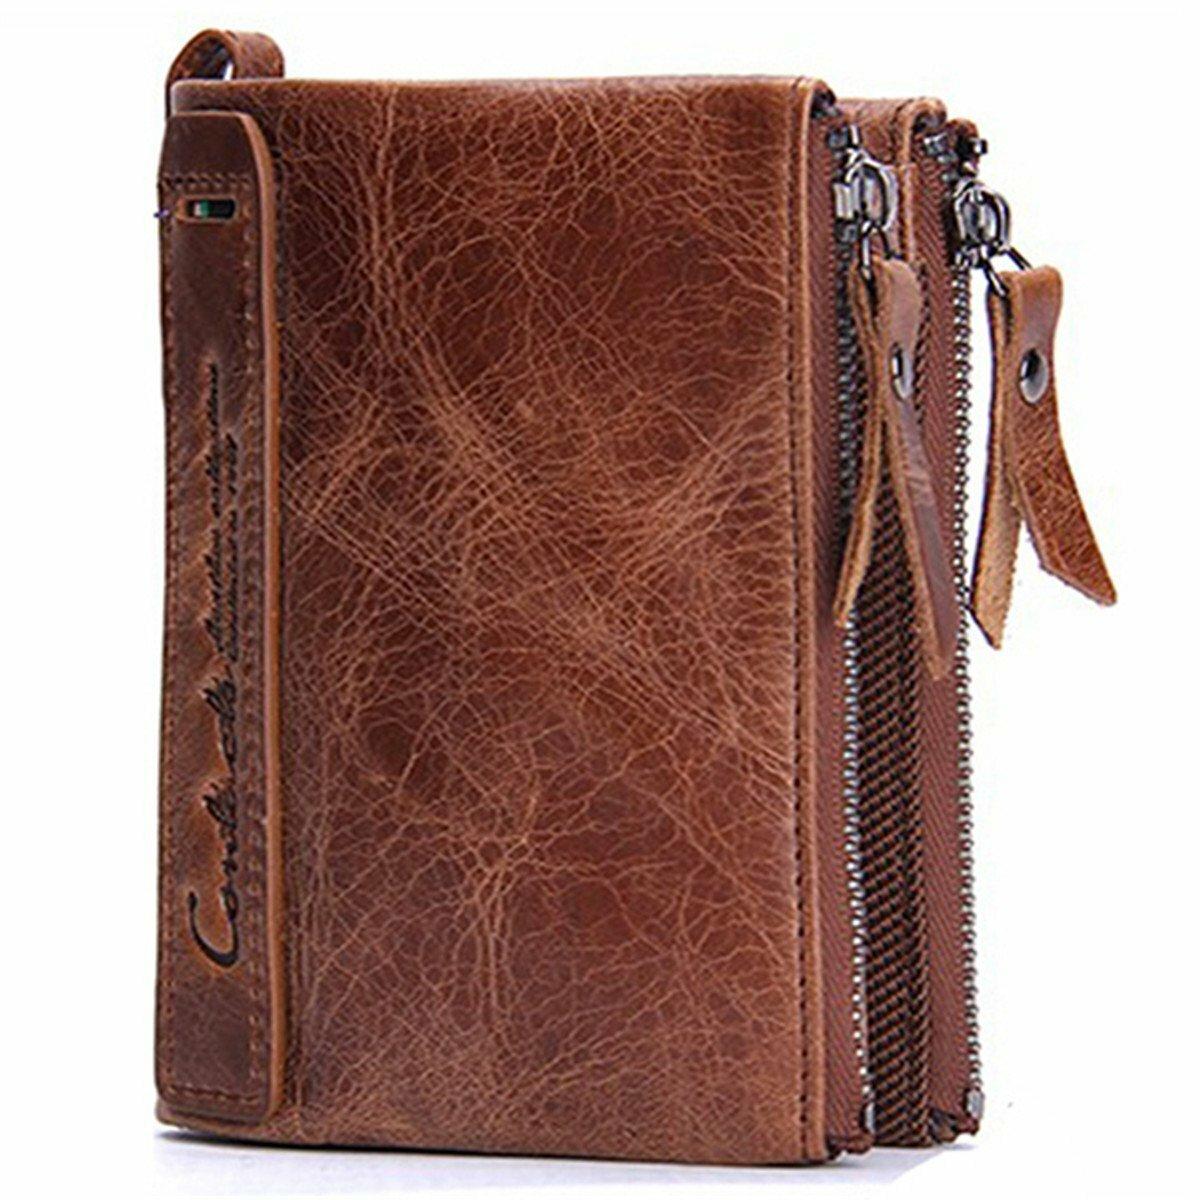 Men Genuine Leather Bifold Hasp Multi-Card Slot Card Holder Retro Double Zipper Pocket Coin Purse Short Money Clip Walle